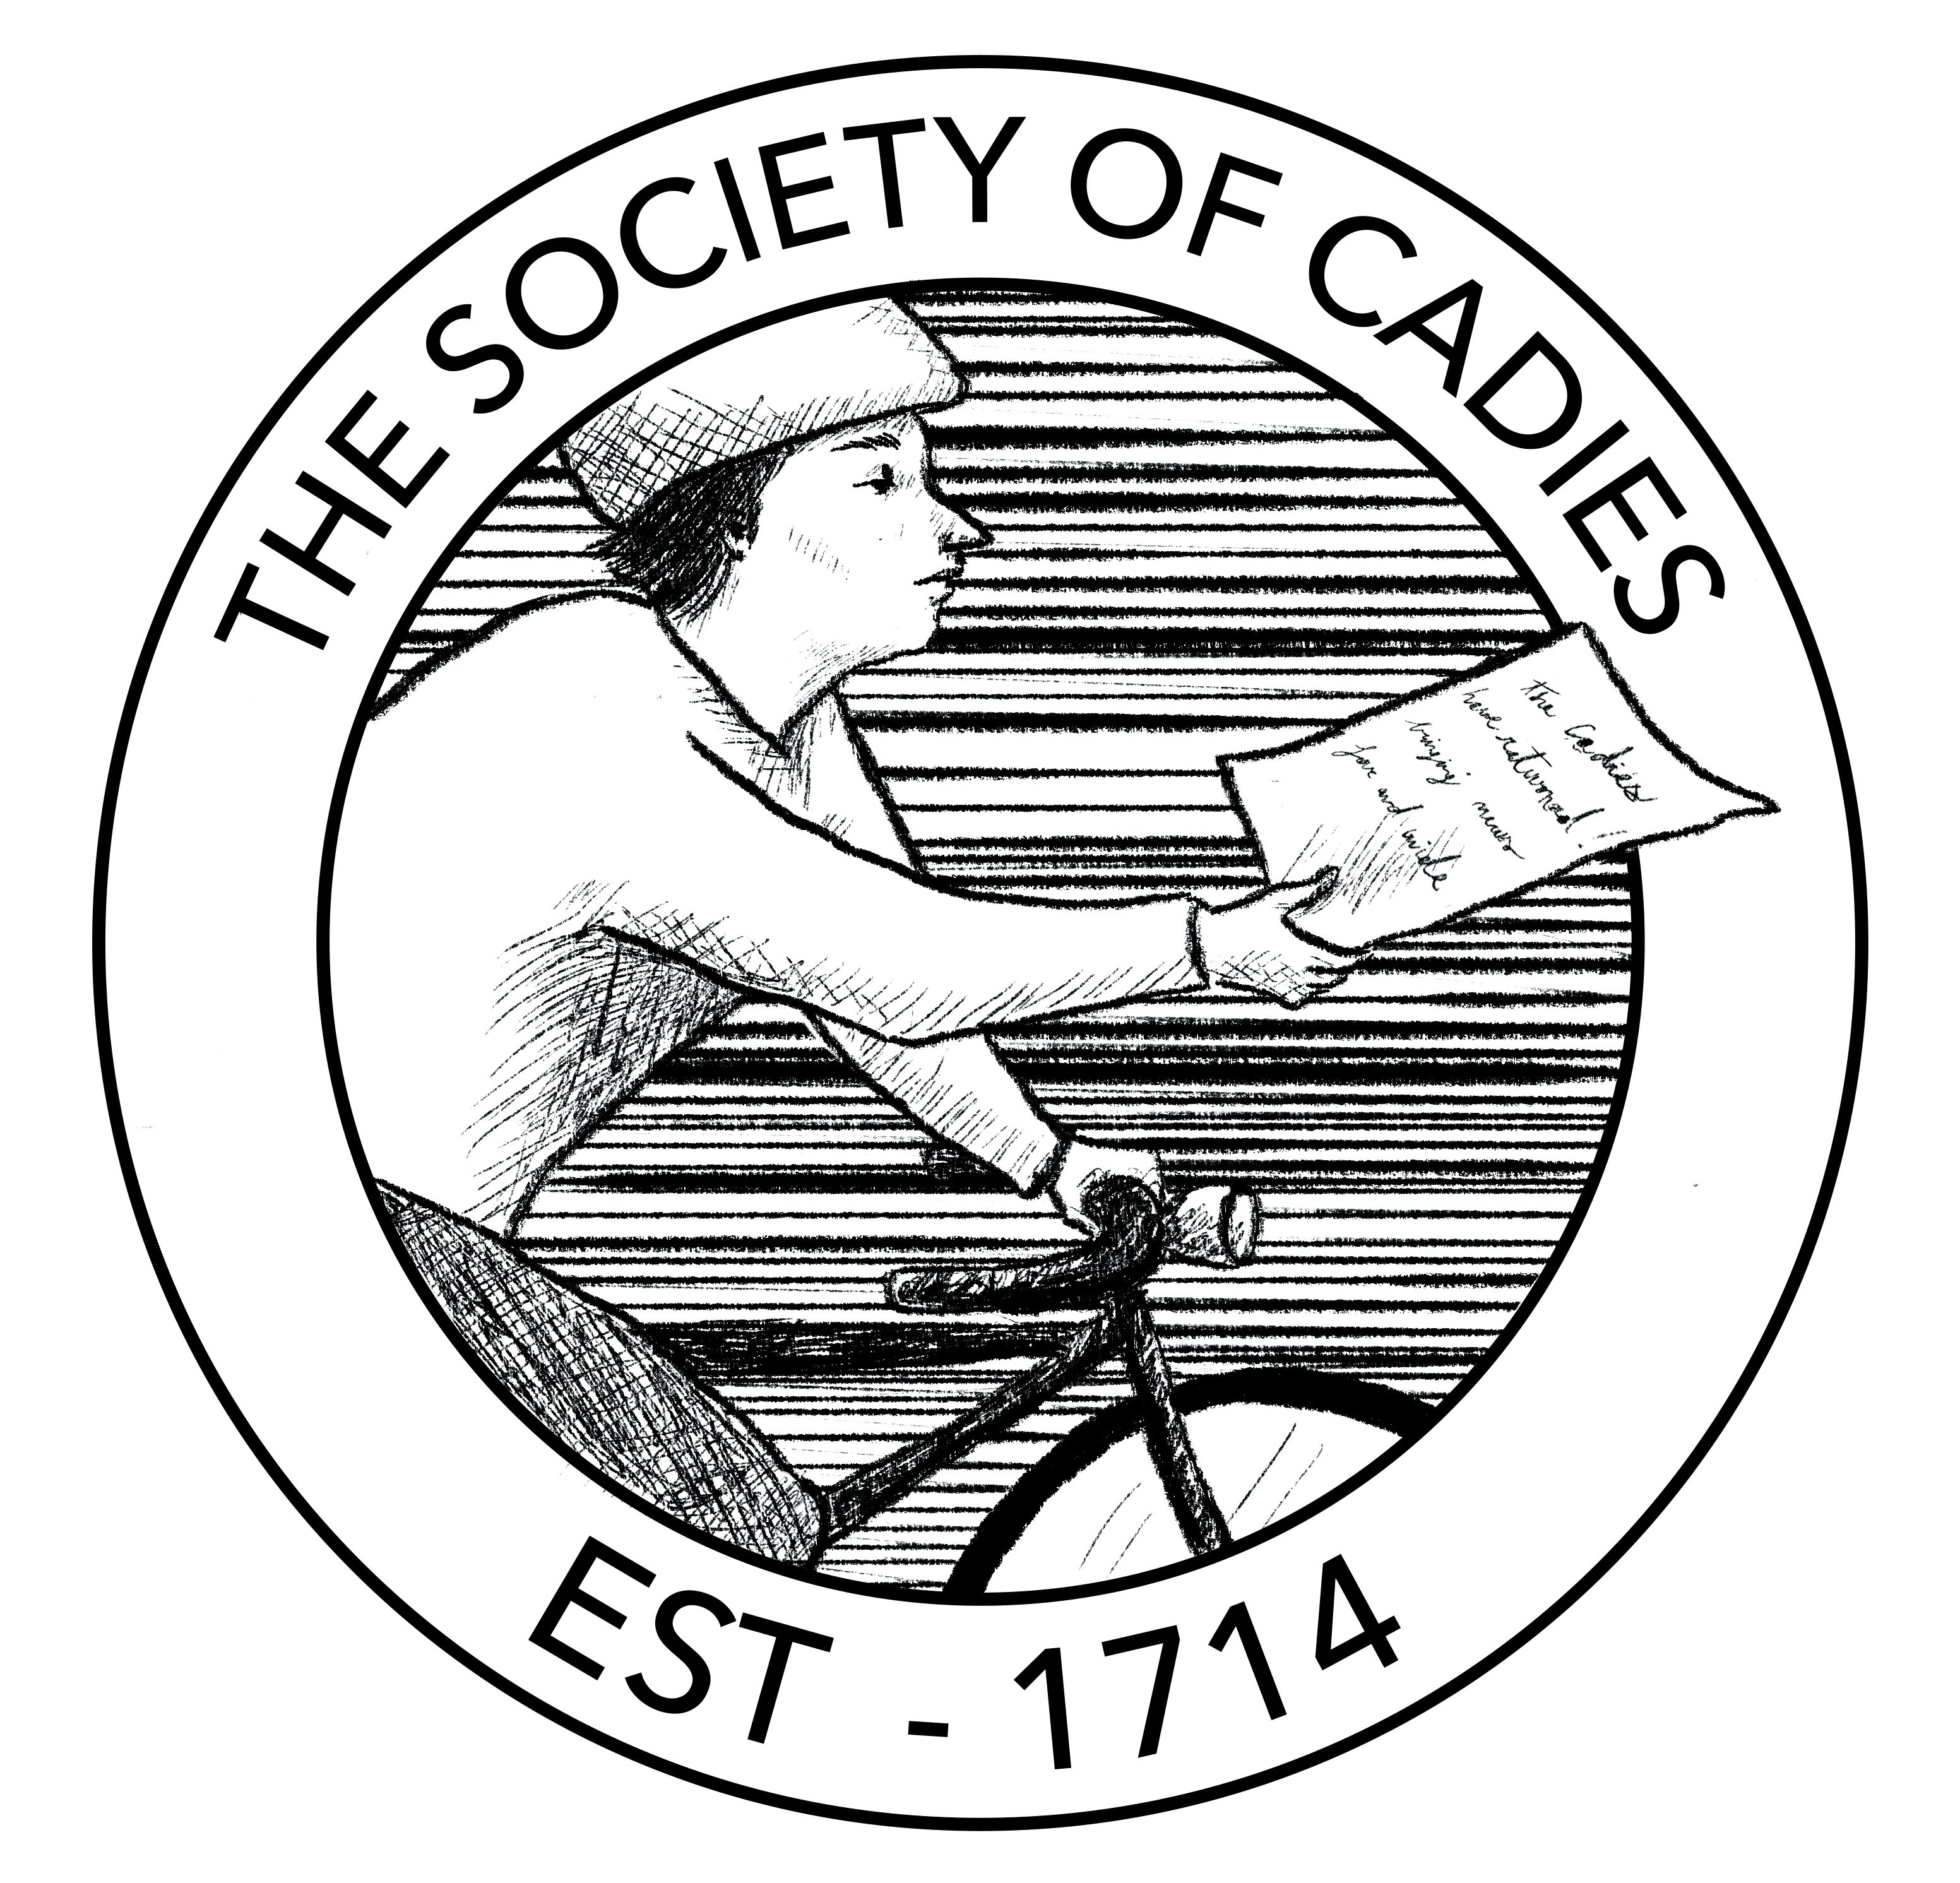 Society of Cadies